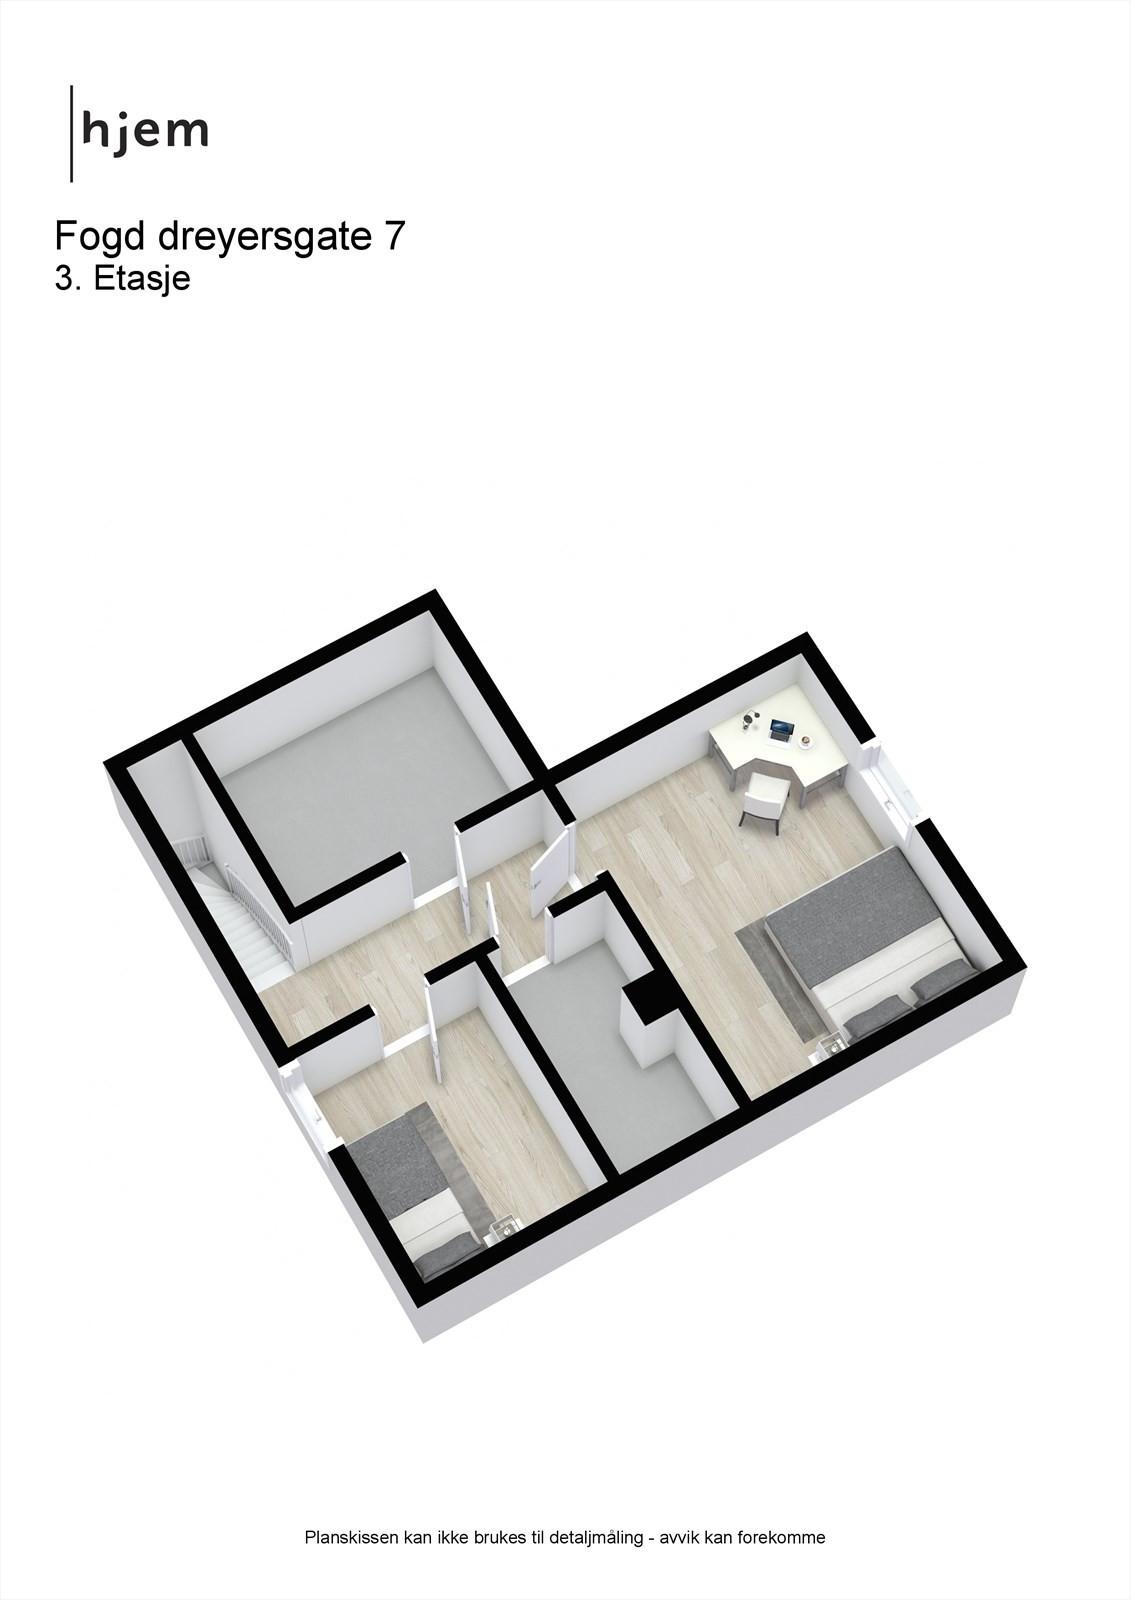 Fogd dreyersgate 7 - 3D - 3. Etasje